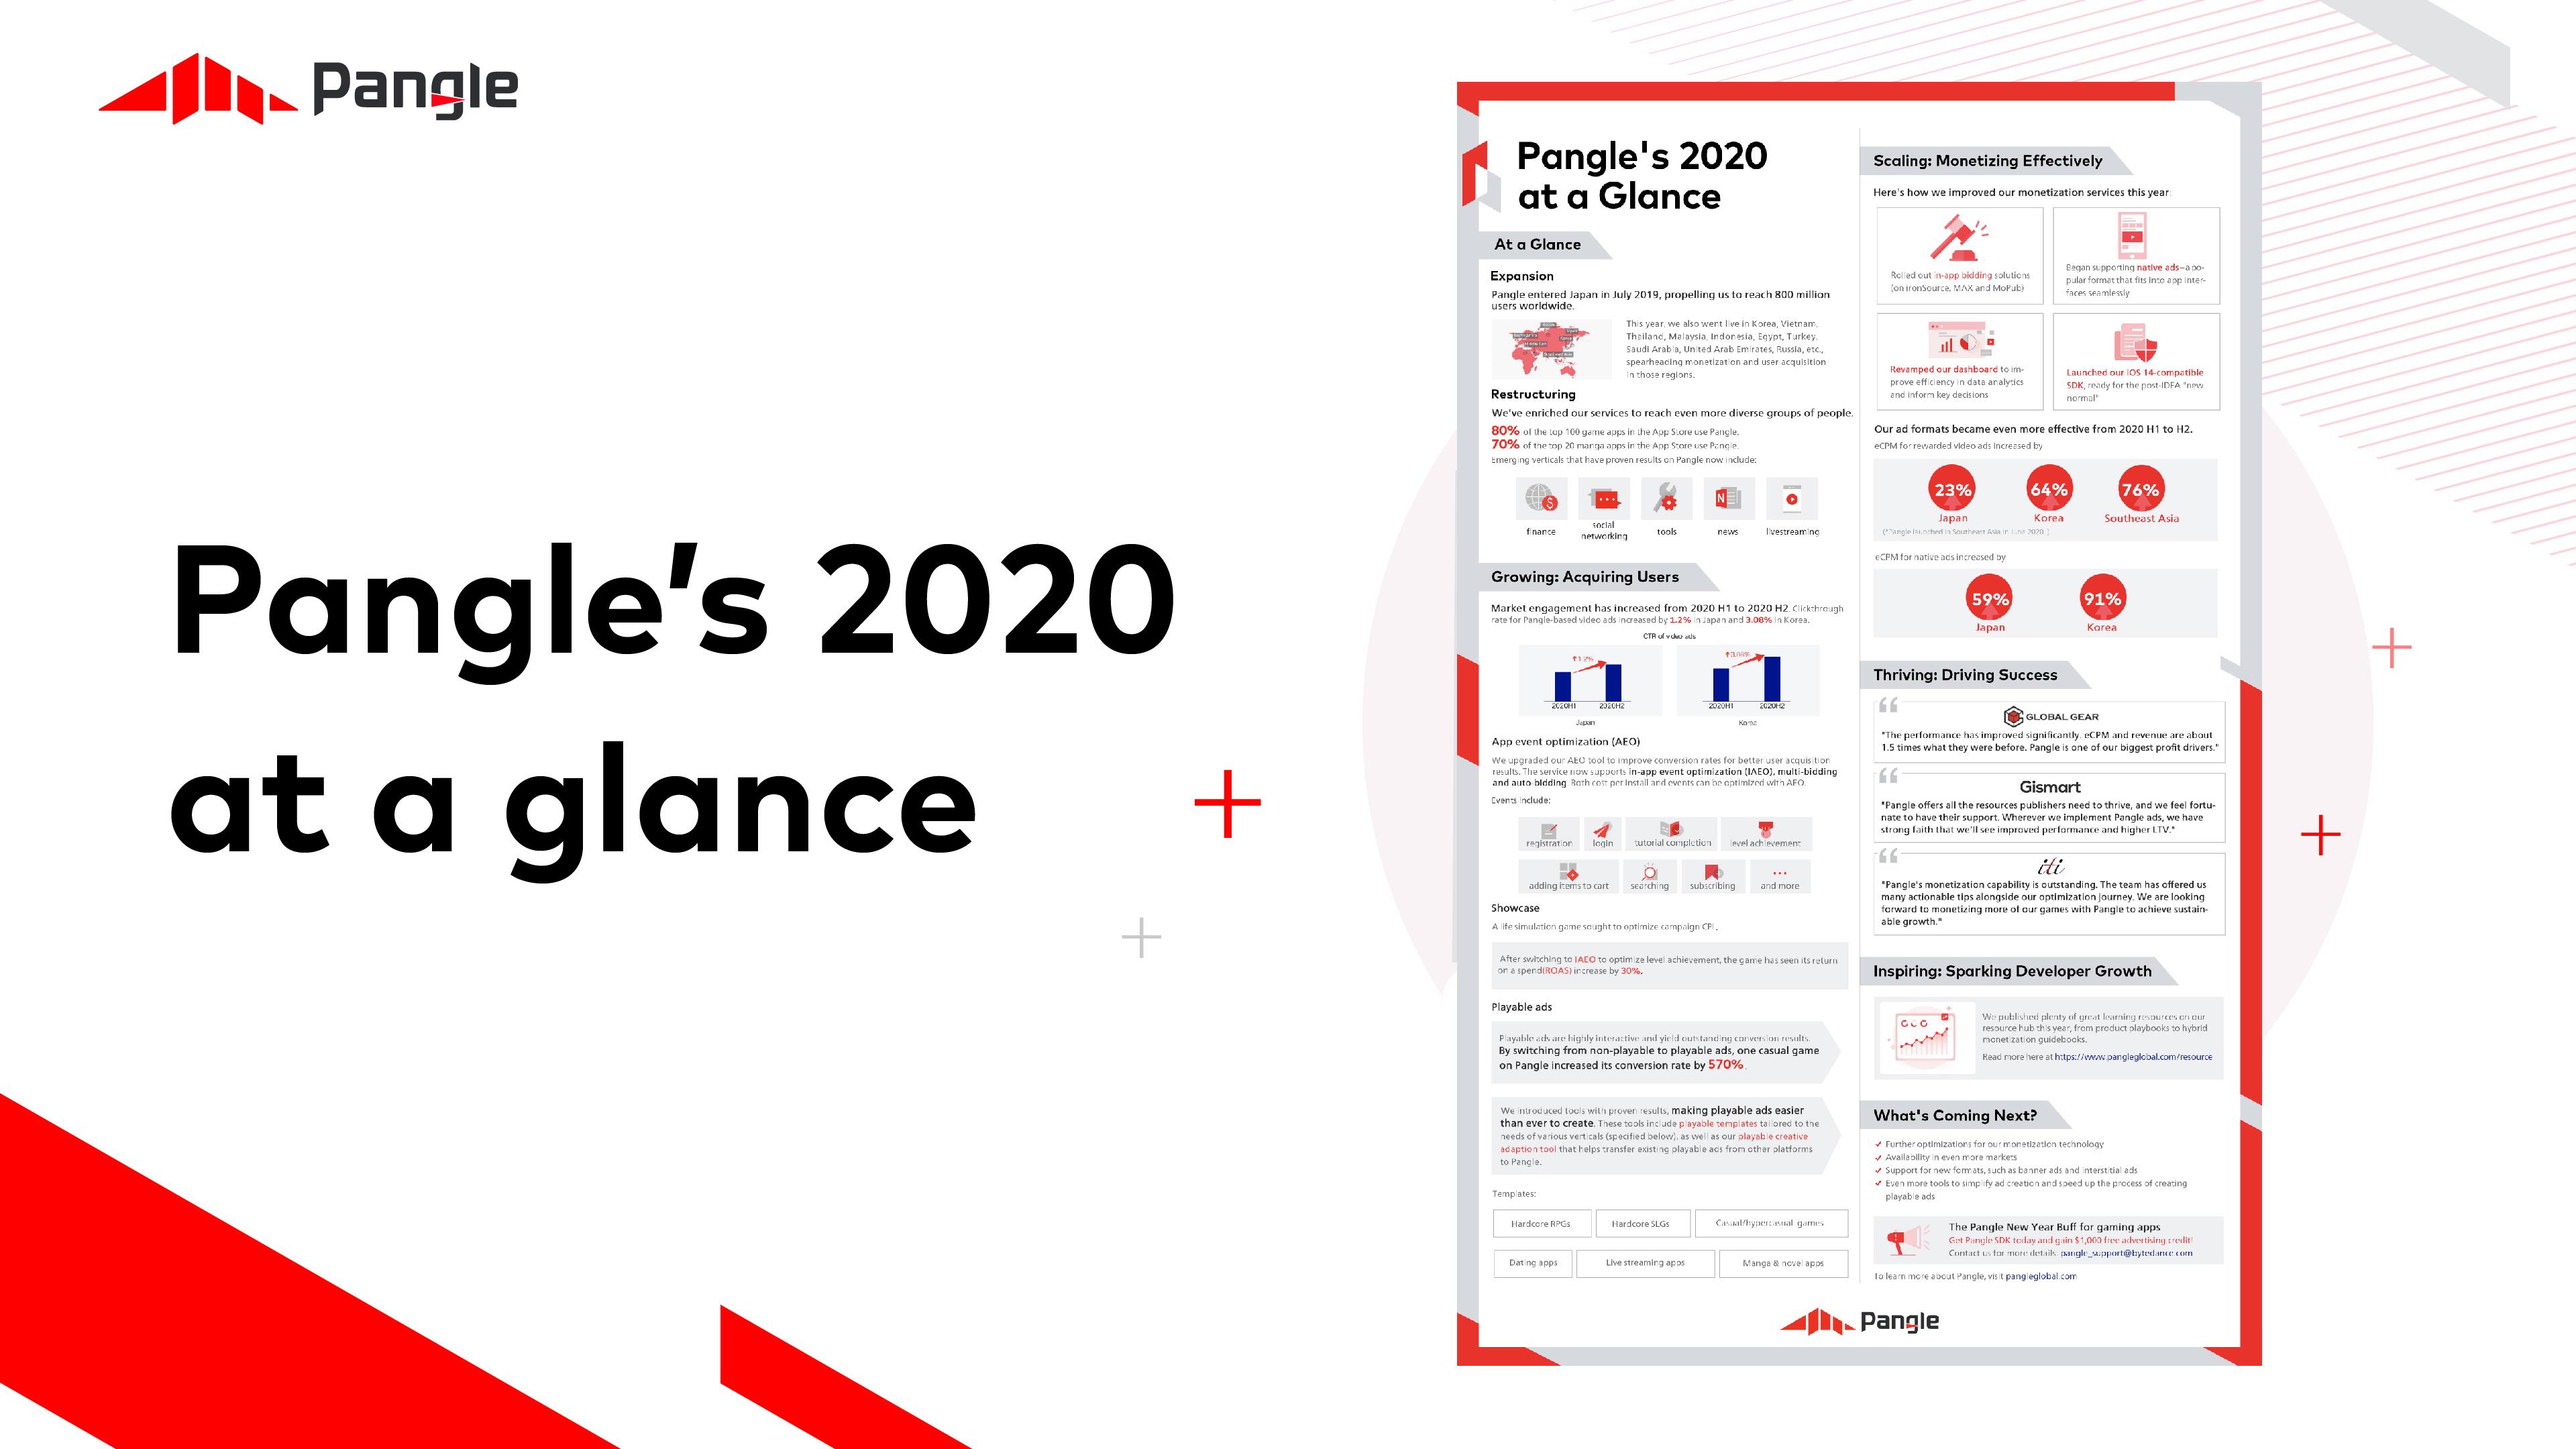 Pangle's 2020 at a glance